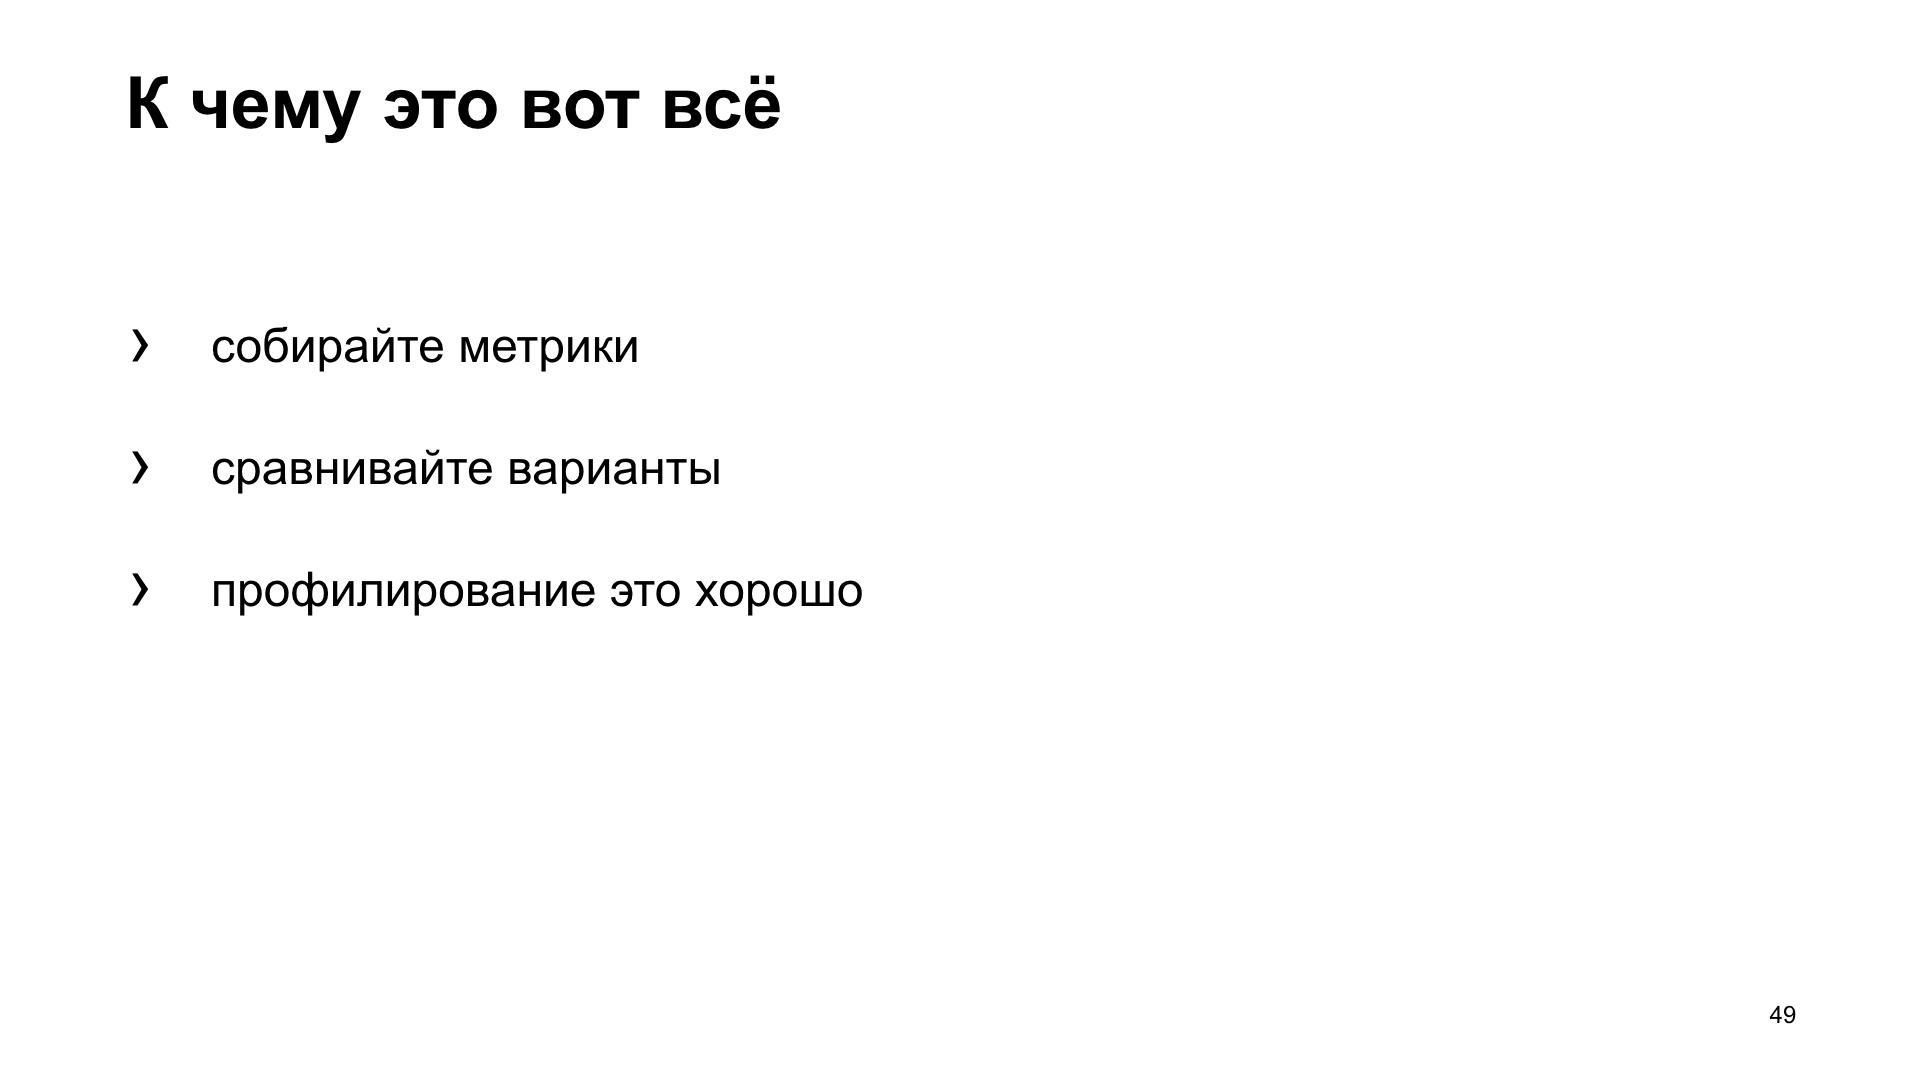 uWSGI в помощь метрикам. Доклад Яндекса - 39